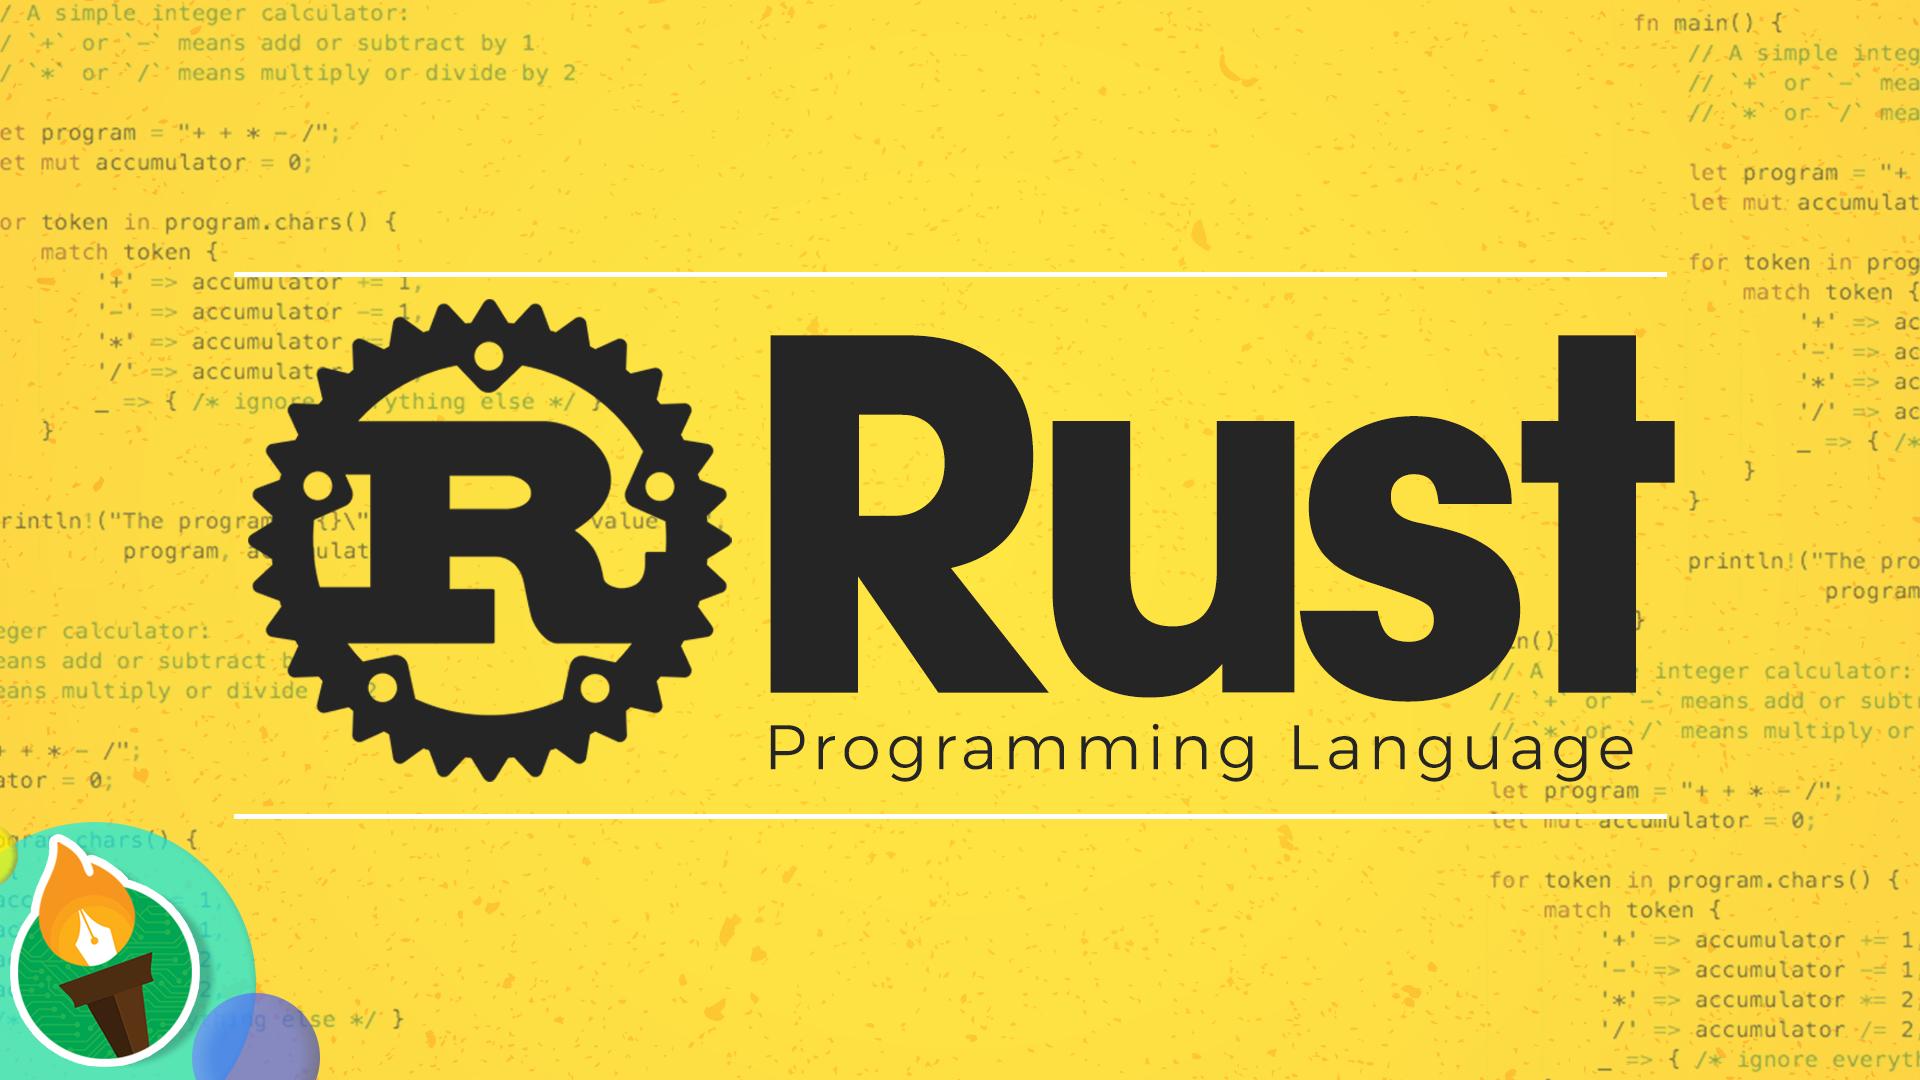 Linux之父:我们不会用Rust取代C语言开发内核插图(1)